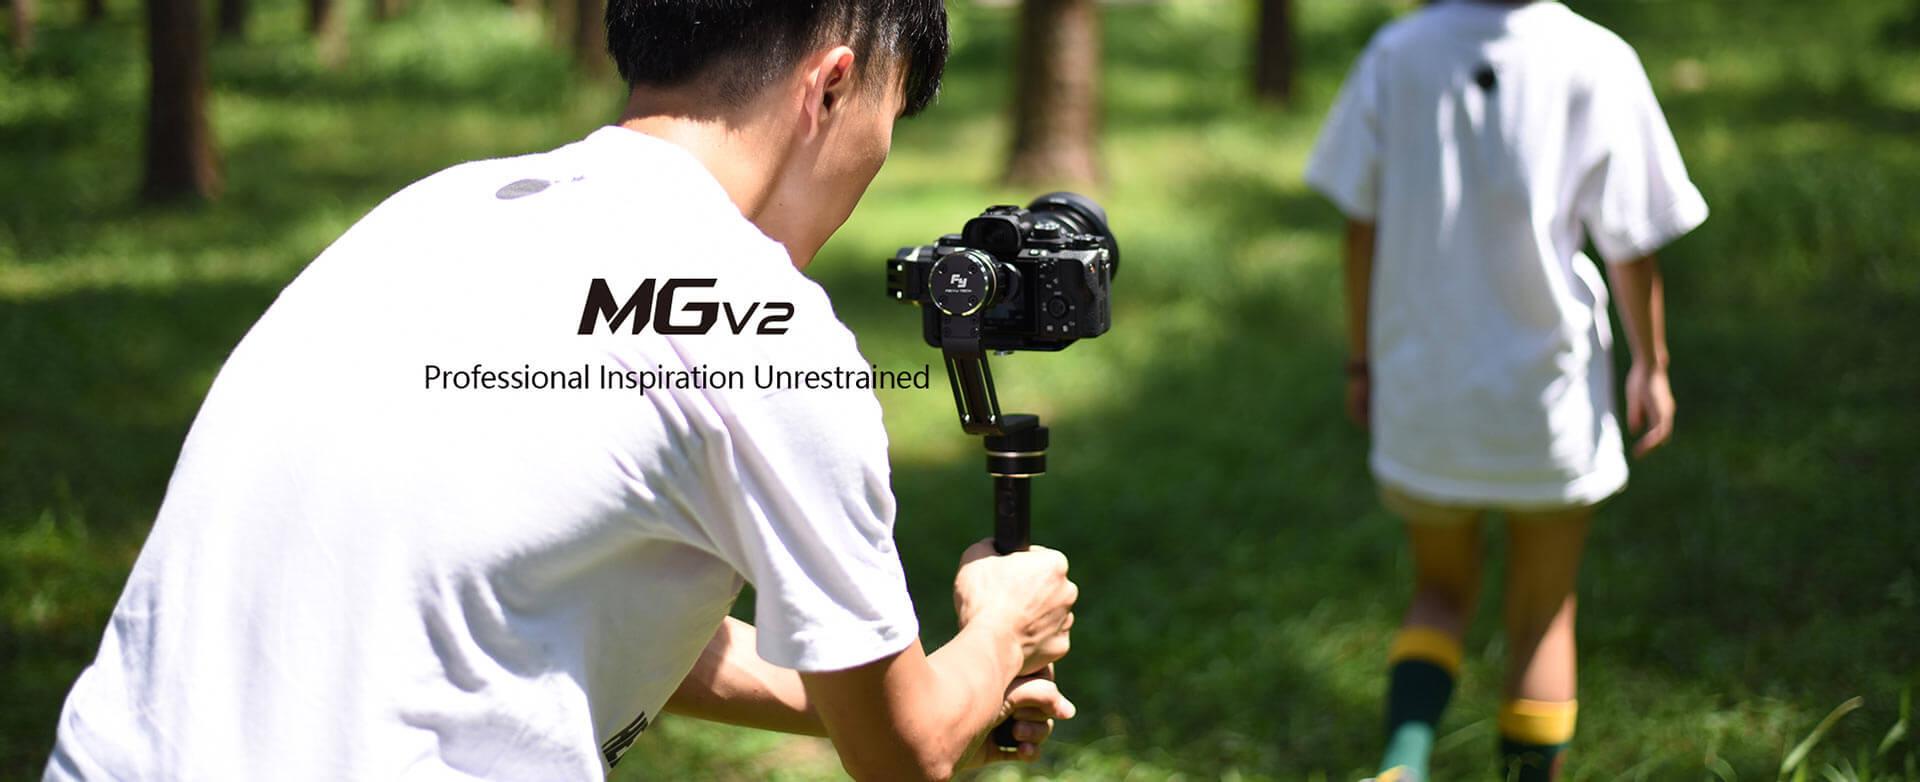 MGV2_01.jpg